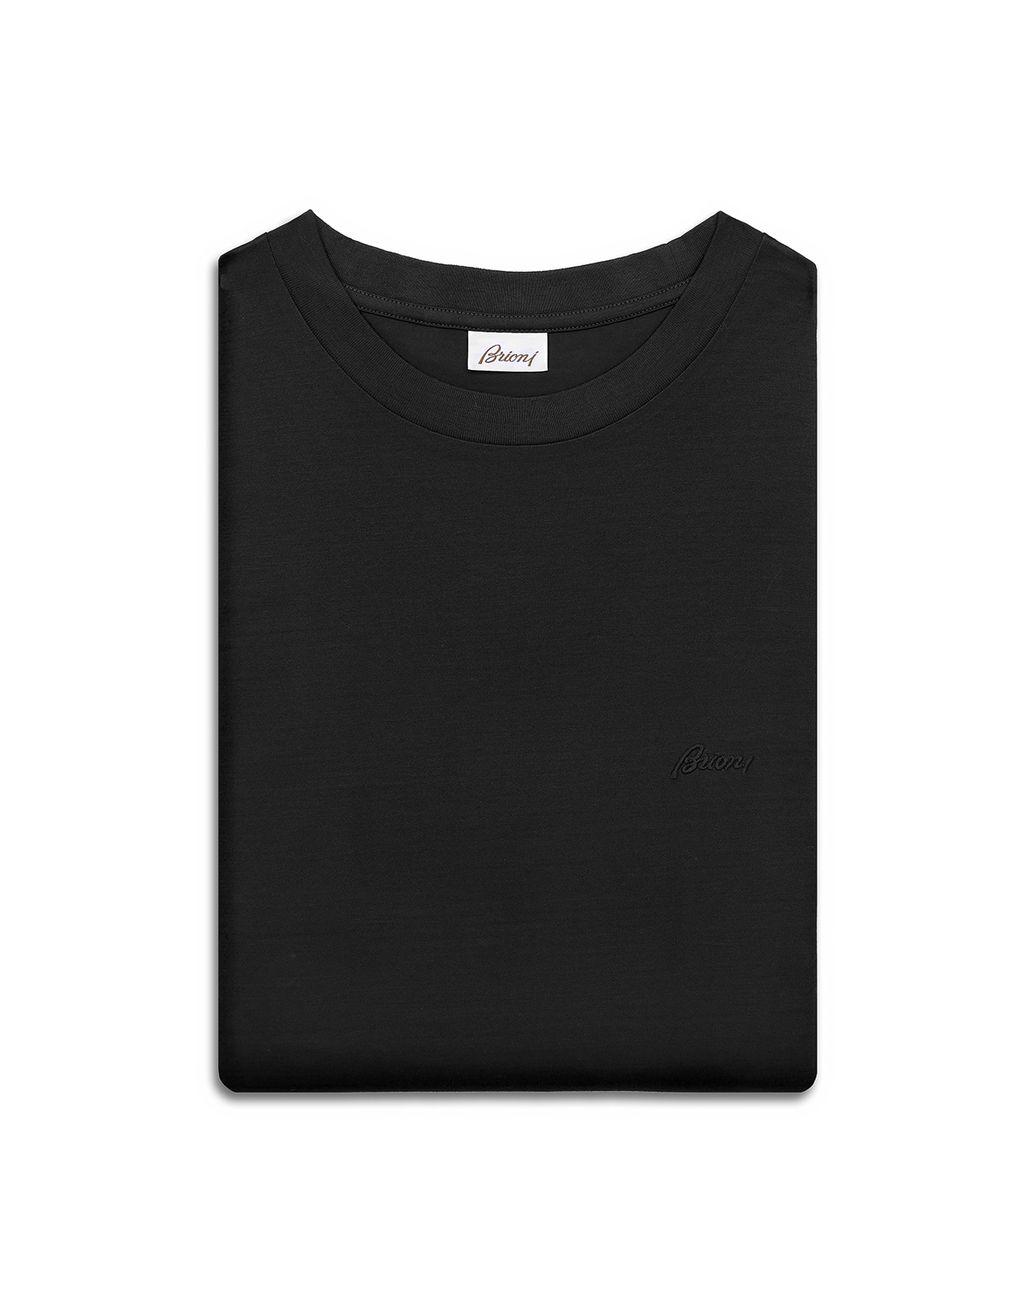 BRIONI Black Logoed T-Shirt T-Shirts & Polos Man e